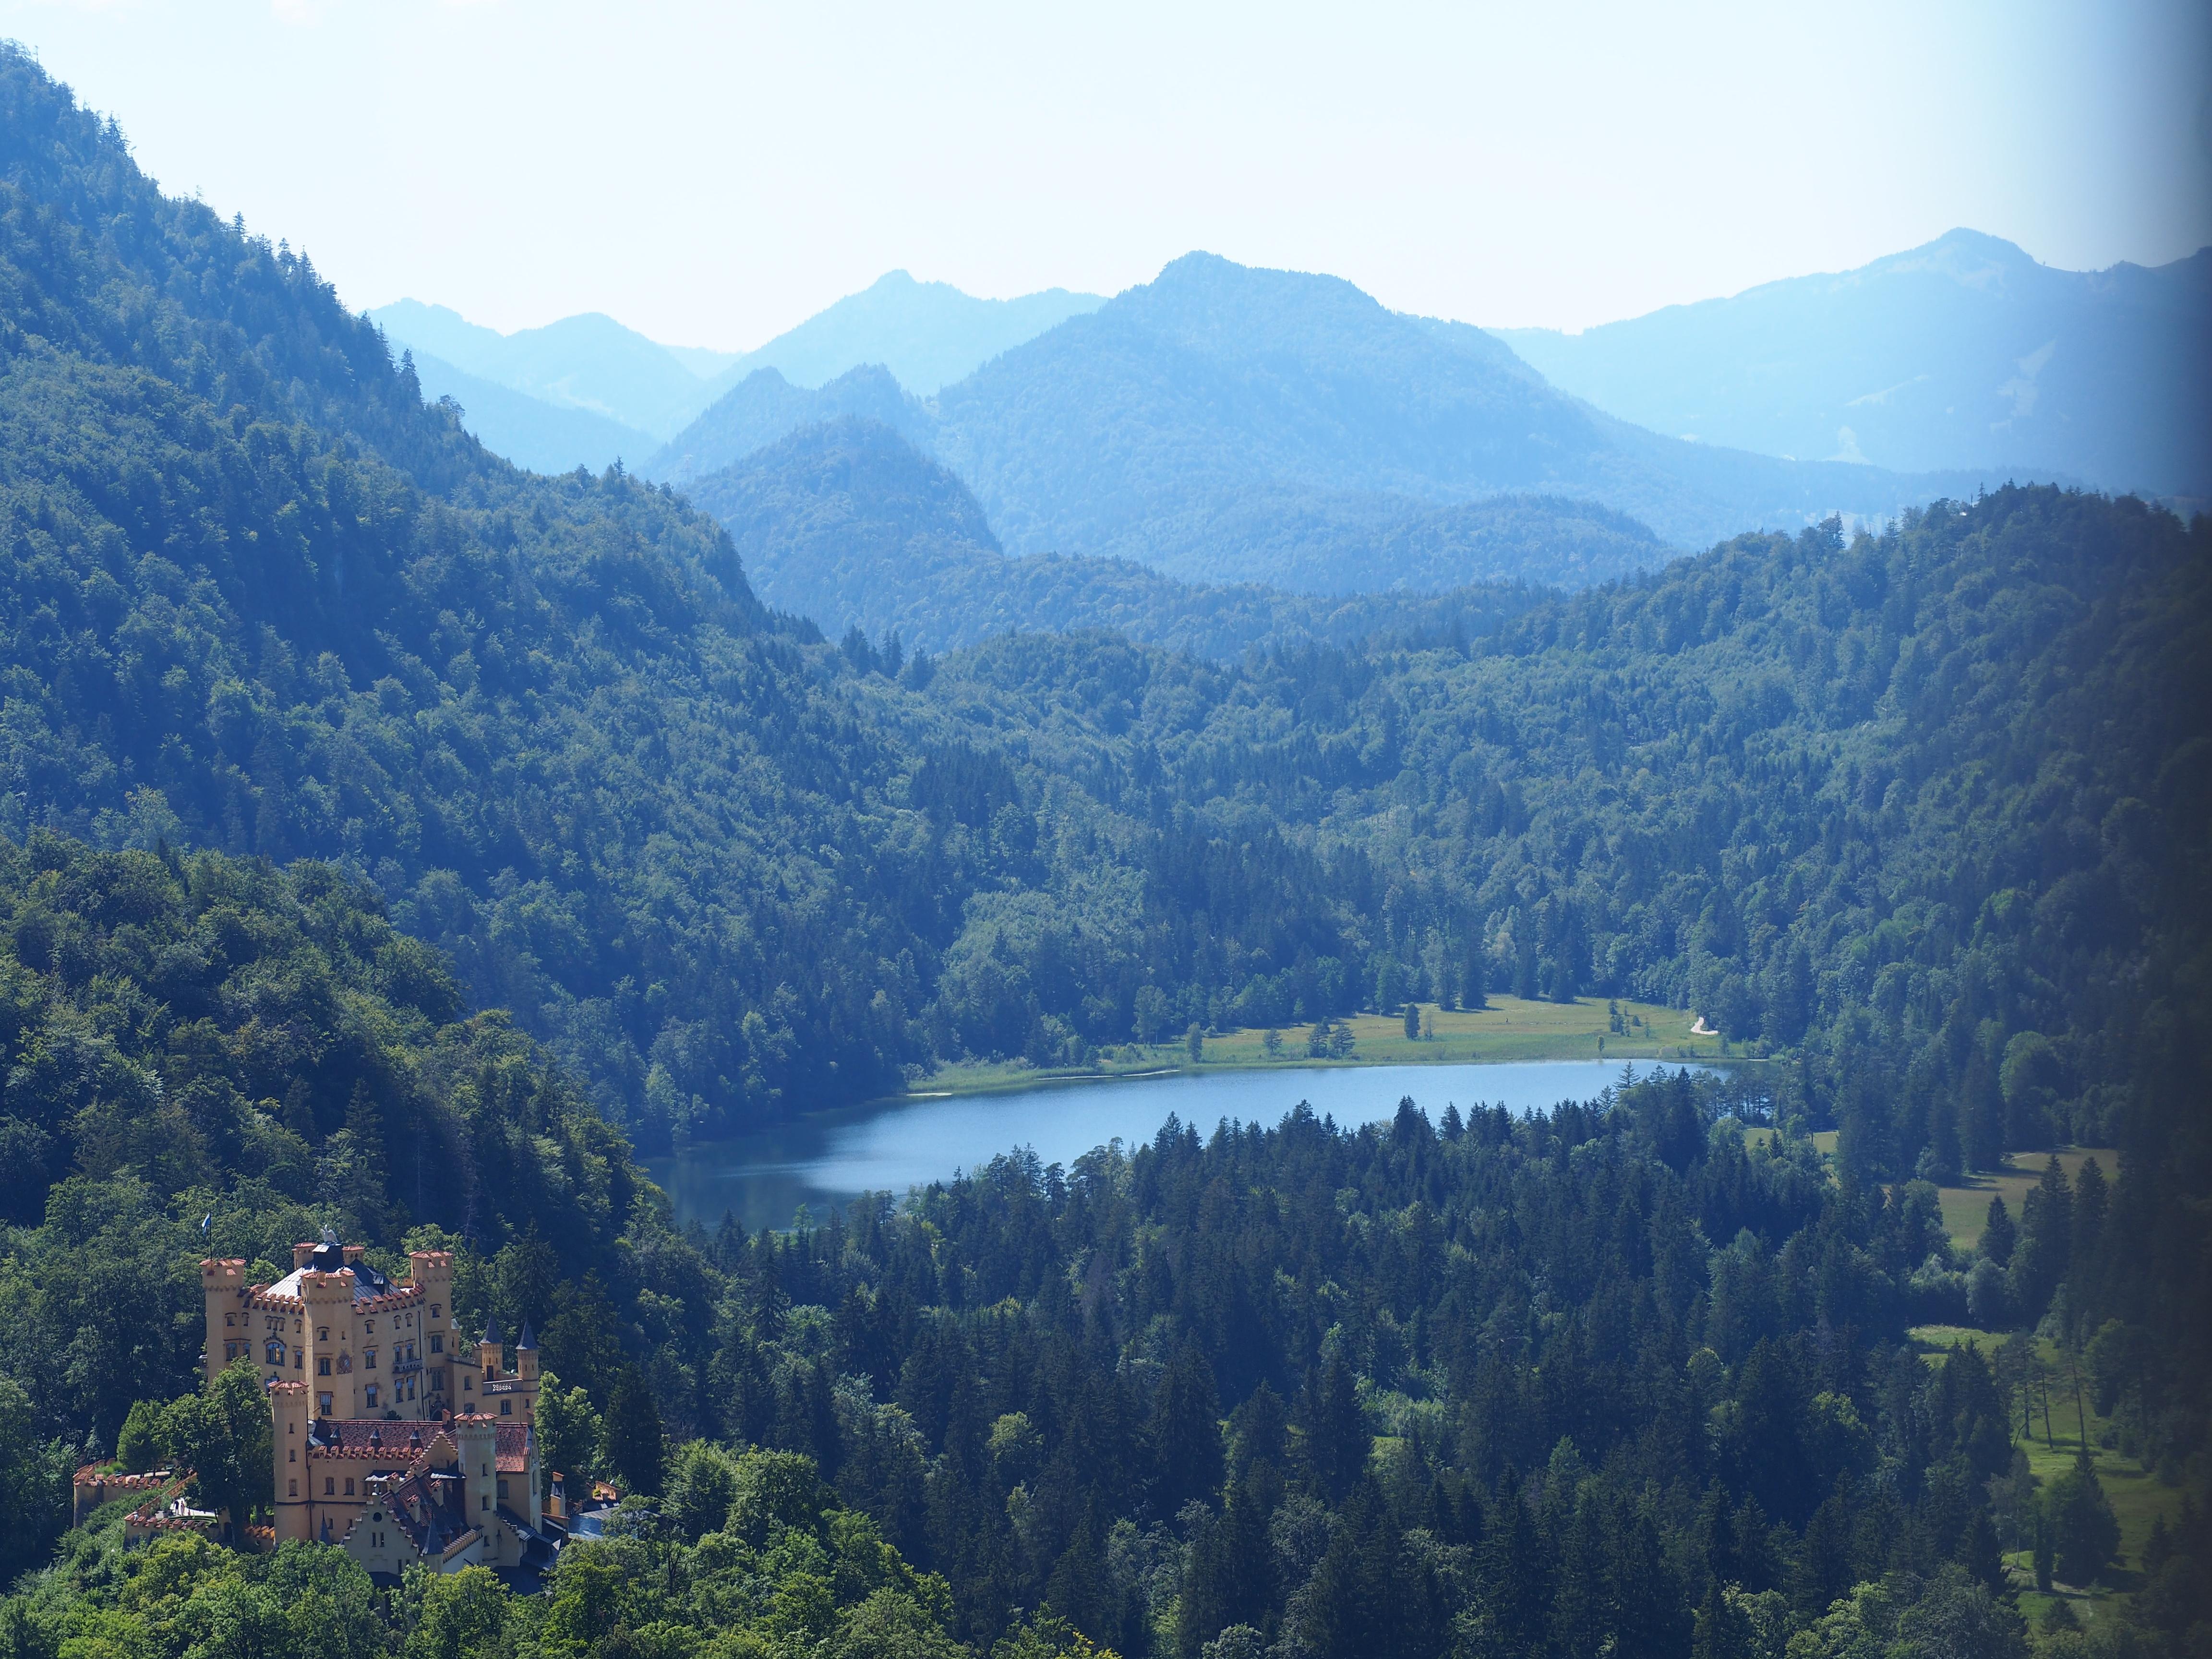 Hohenschwangau-chateau-baviee-allemagne-voyage-clioandco